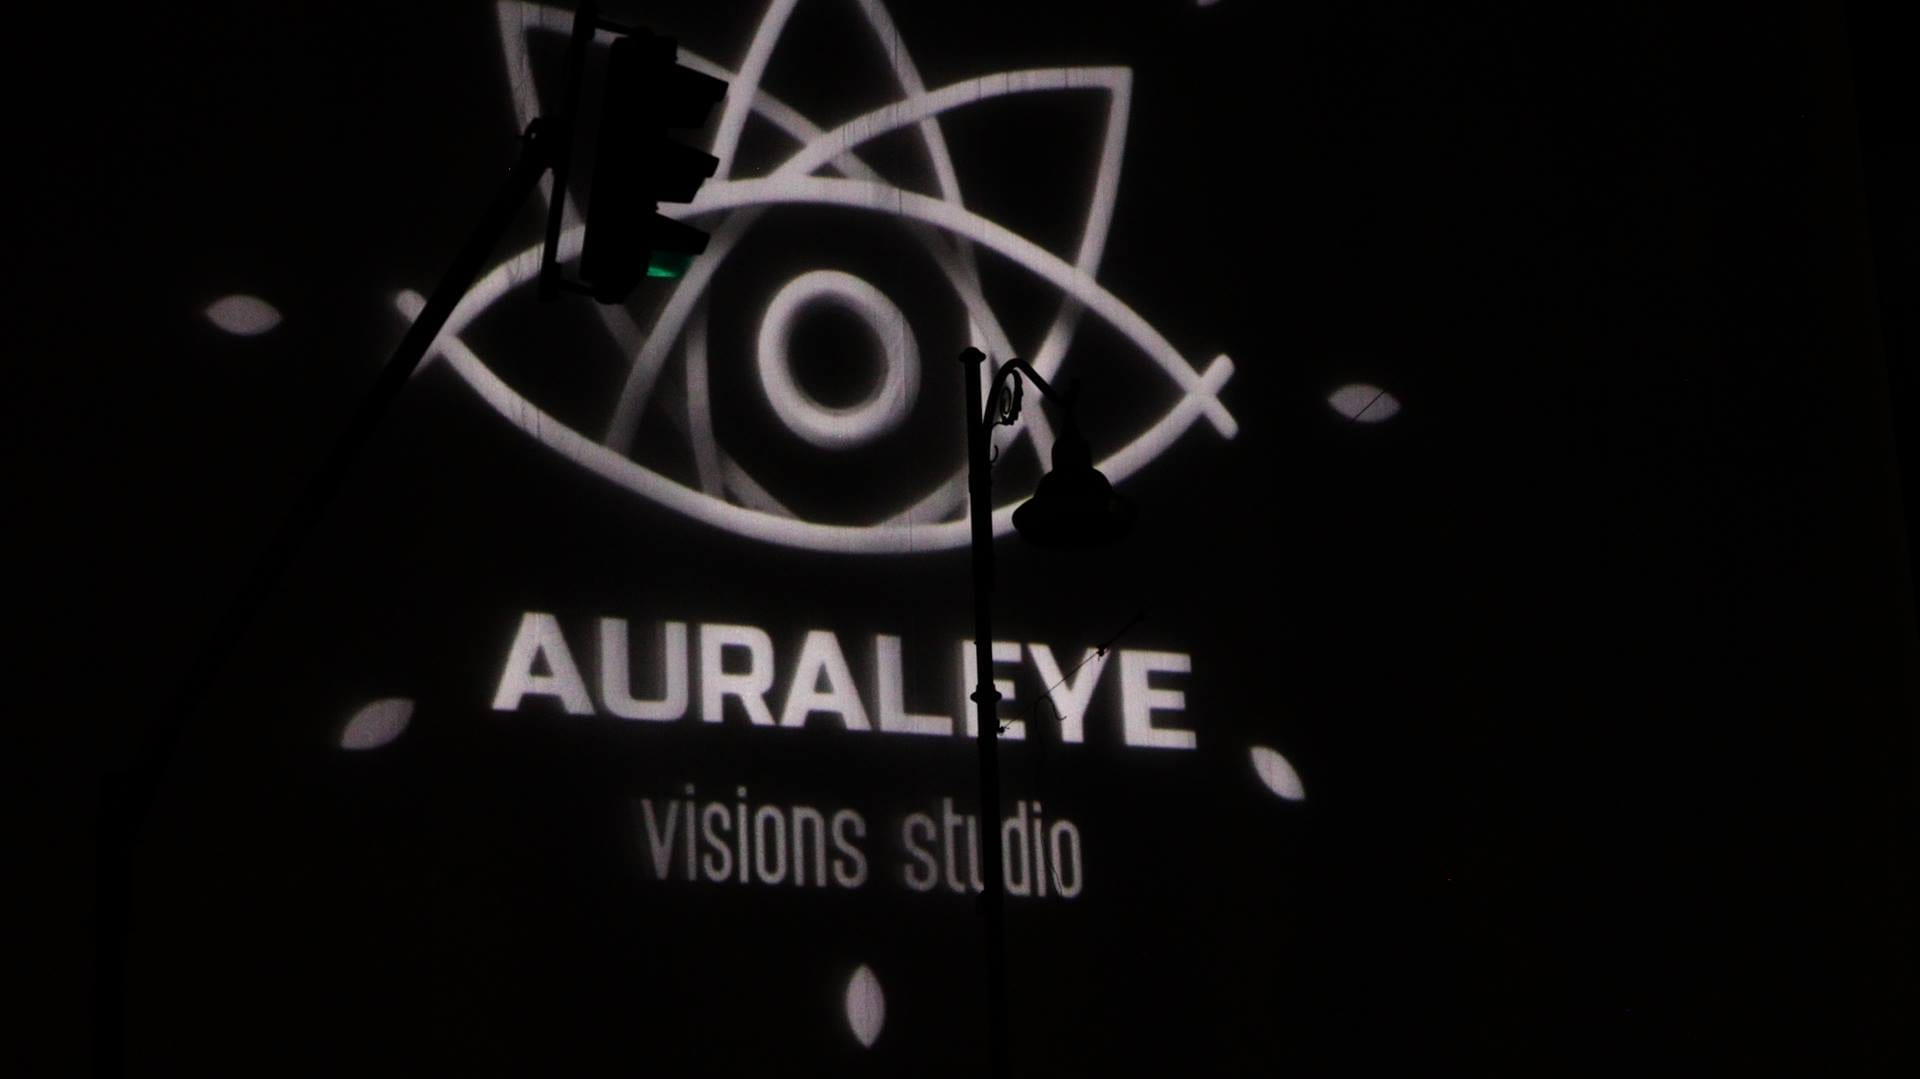 feeder insder w/ Aural Eye